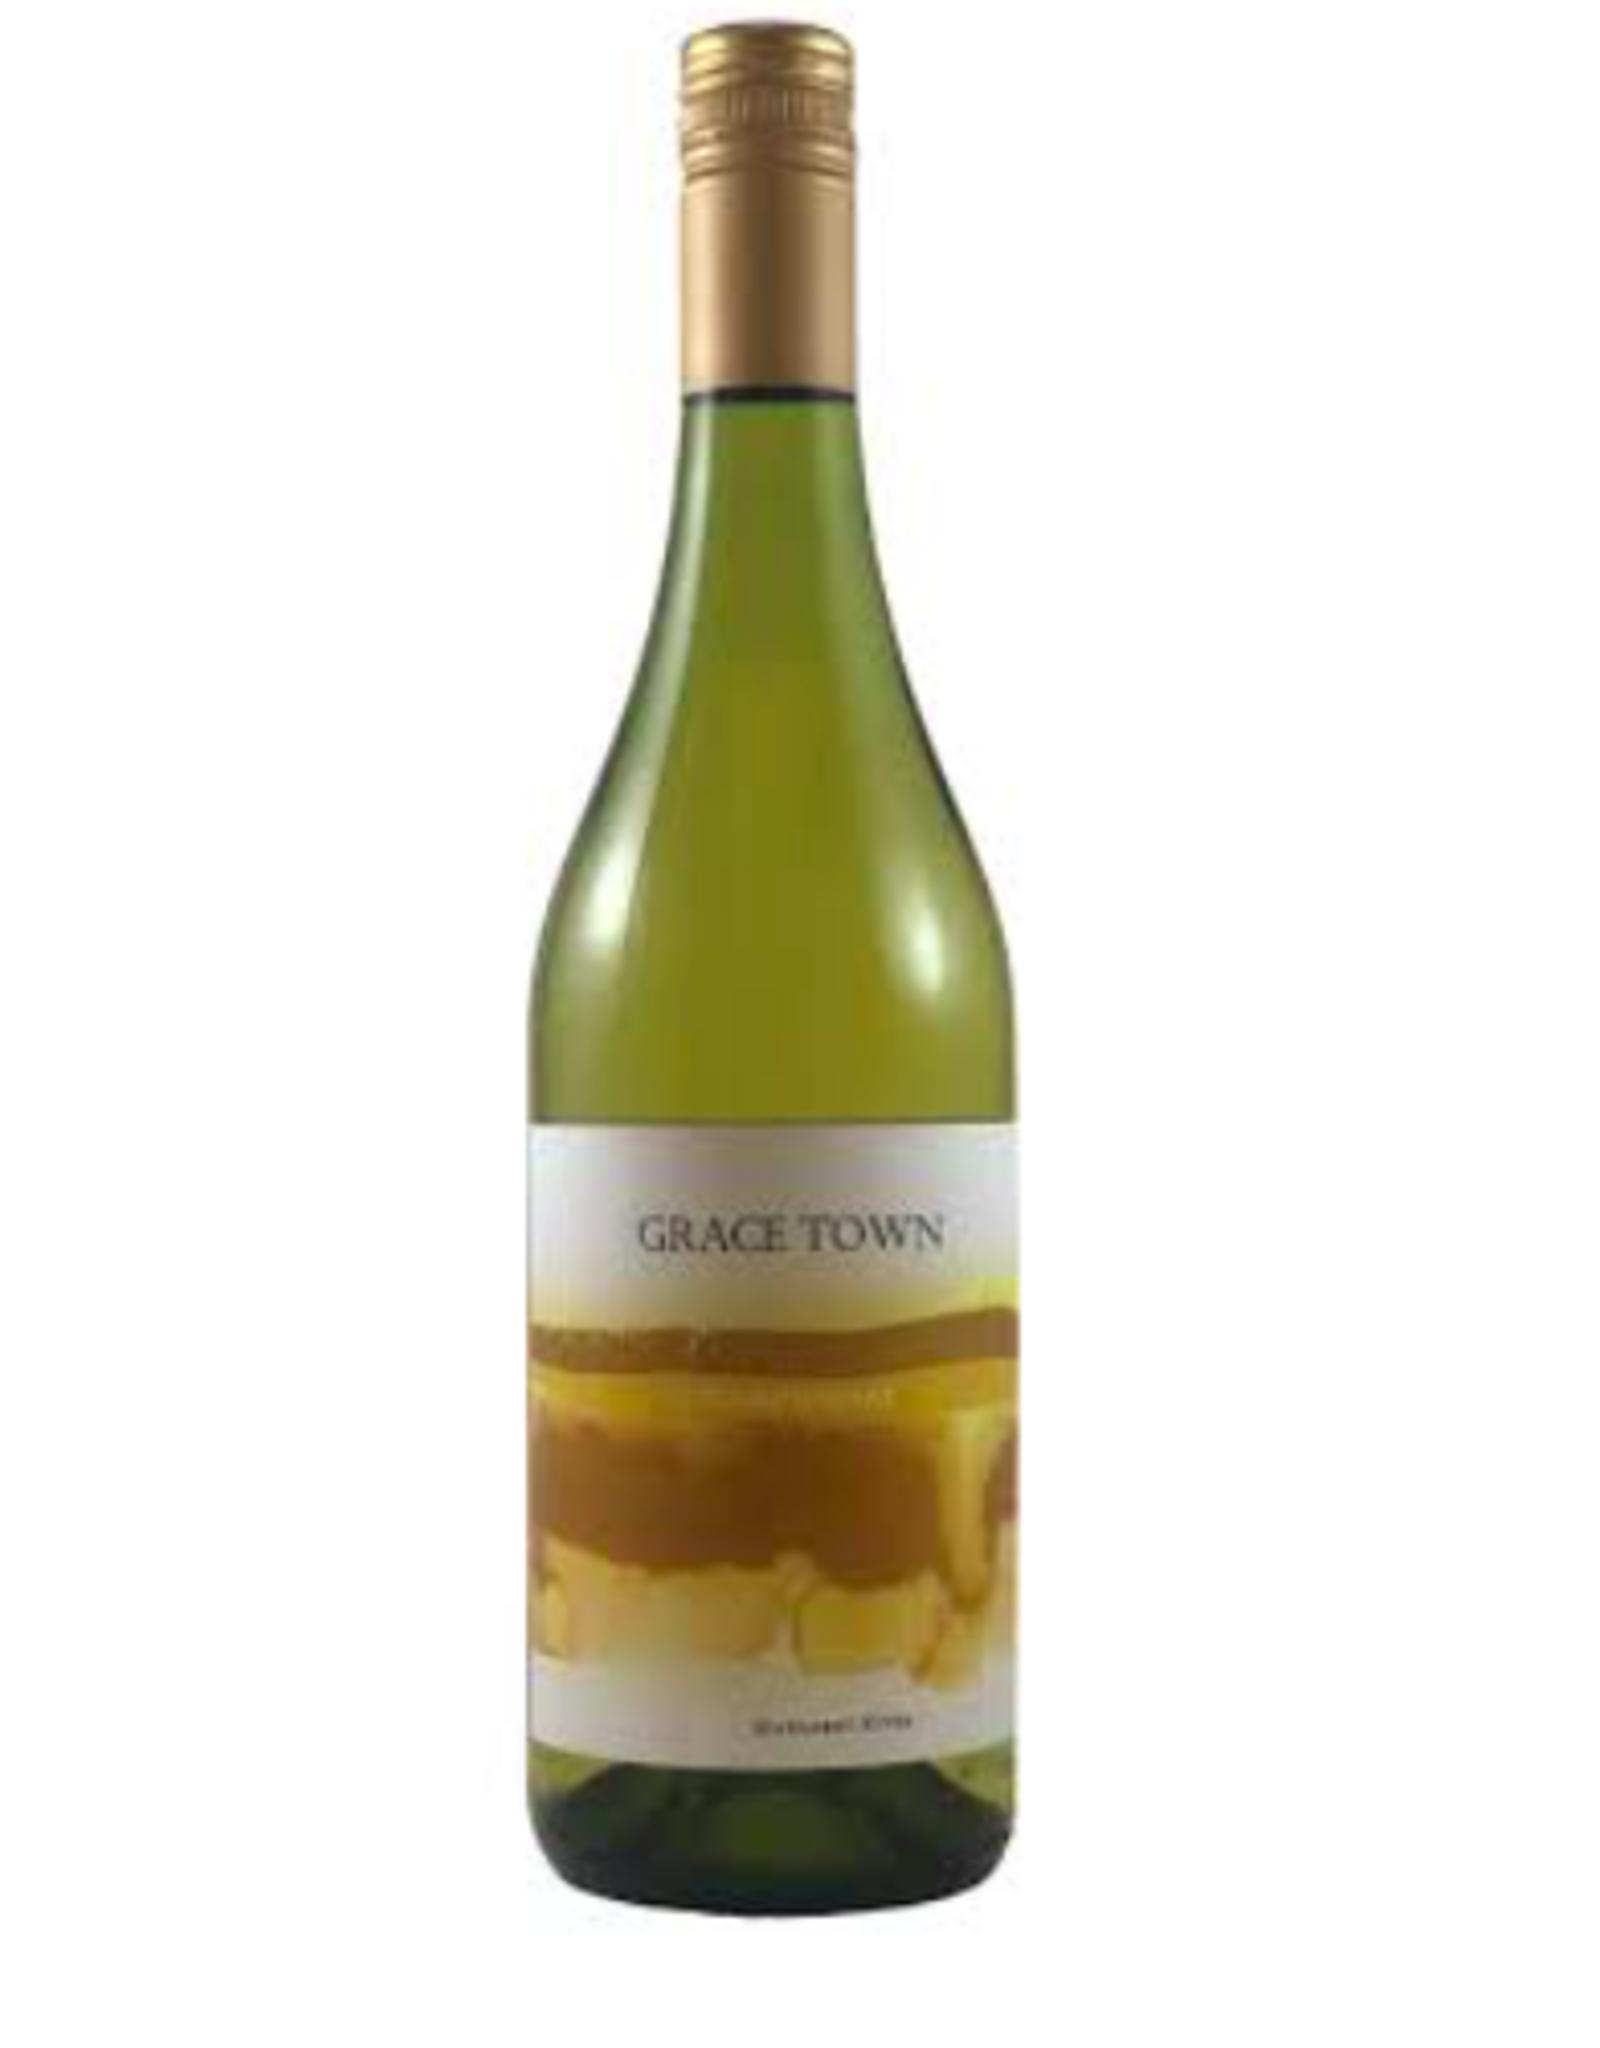 Grace Town Chardonnay Margaret River 2020